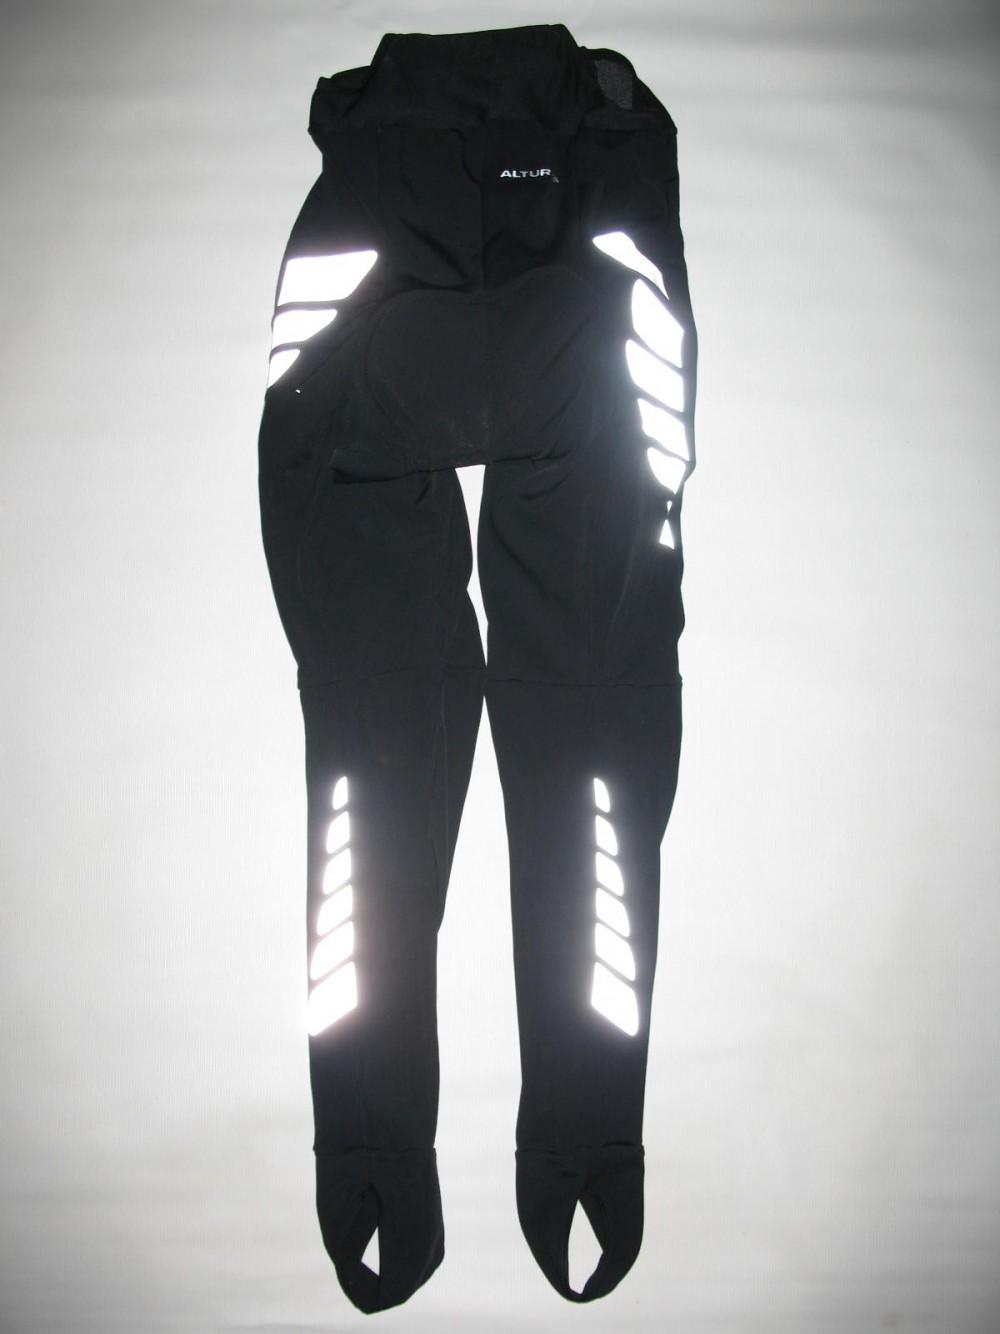 Велобрюки ALTIMA nigth vision bib cycling pants (размер L) - 2